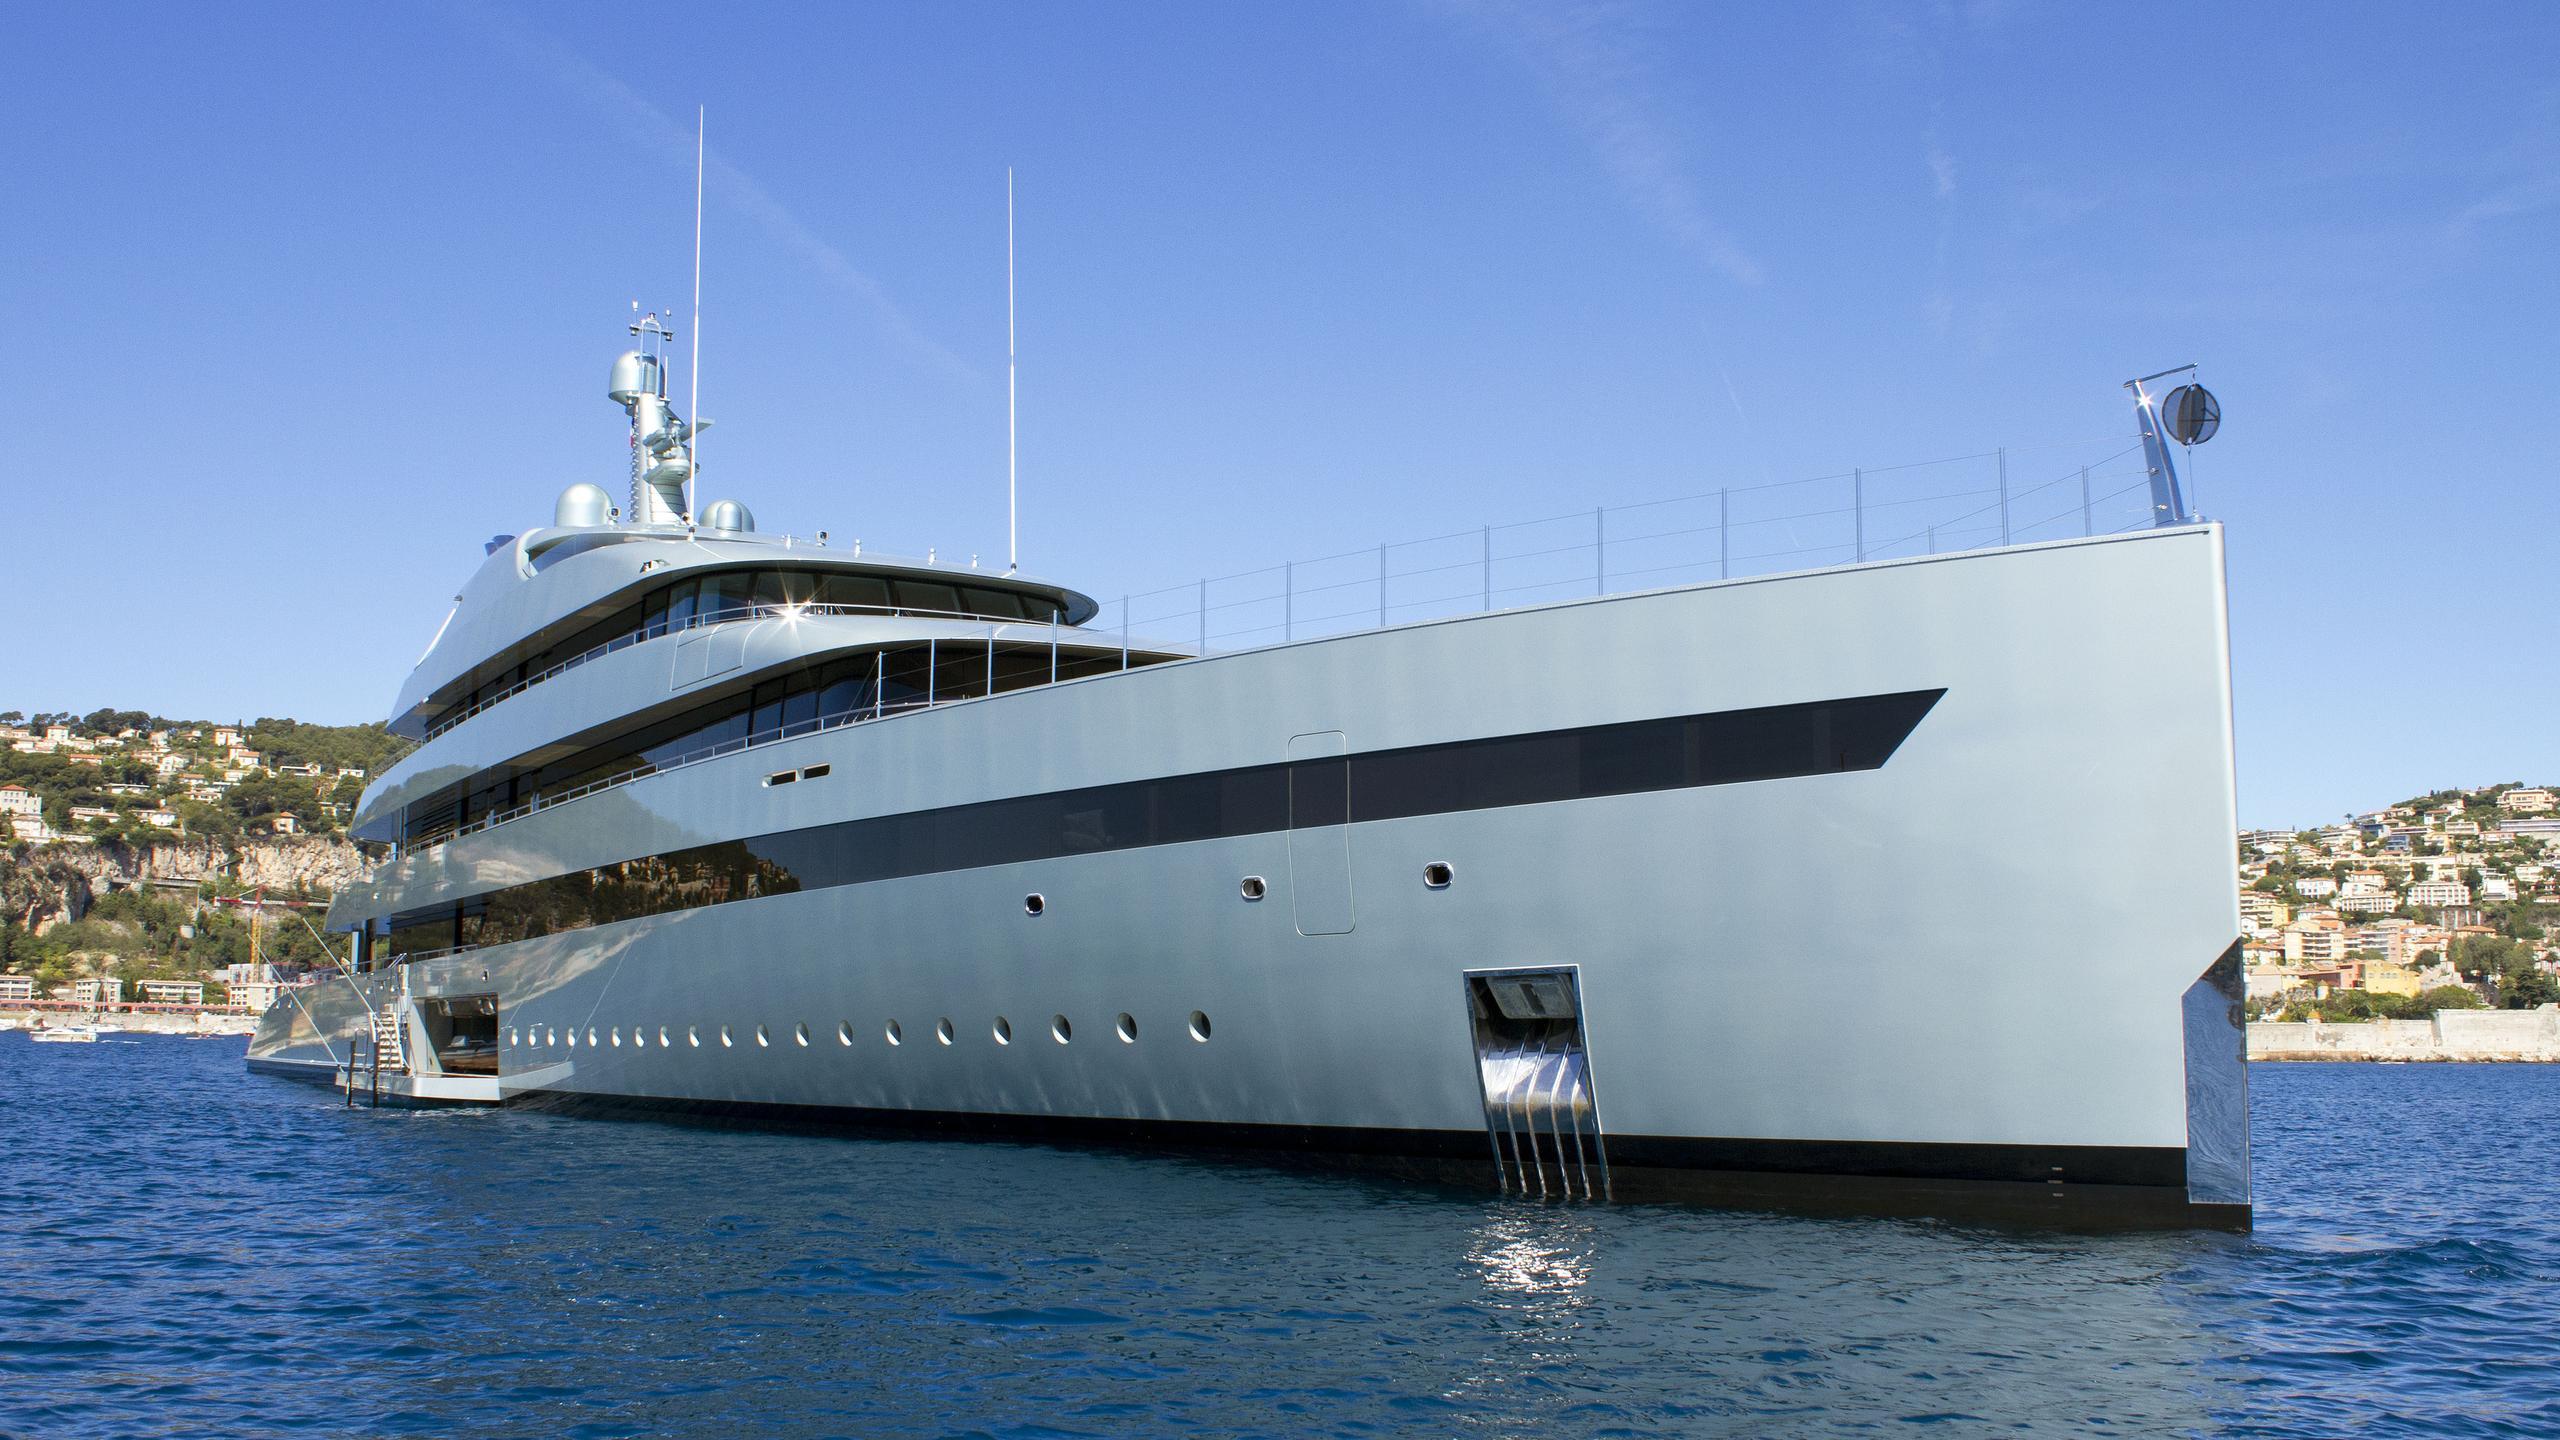 Savannah-motor-yacht-feadship-2015-83m-half-profile